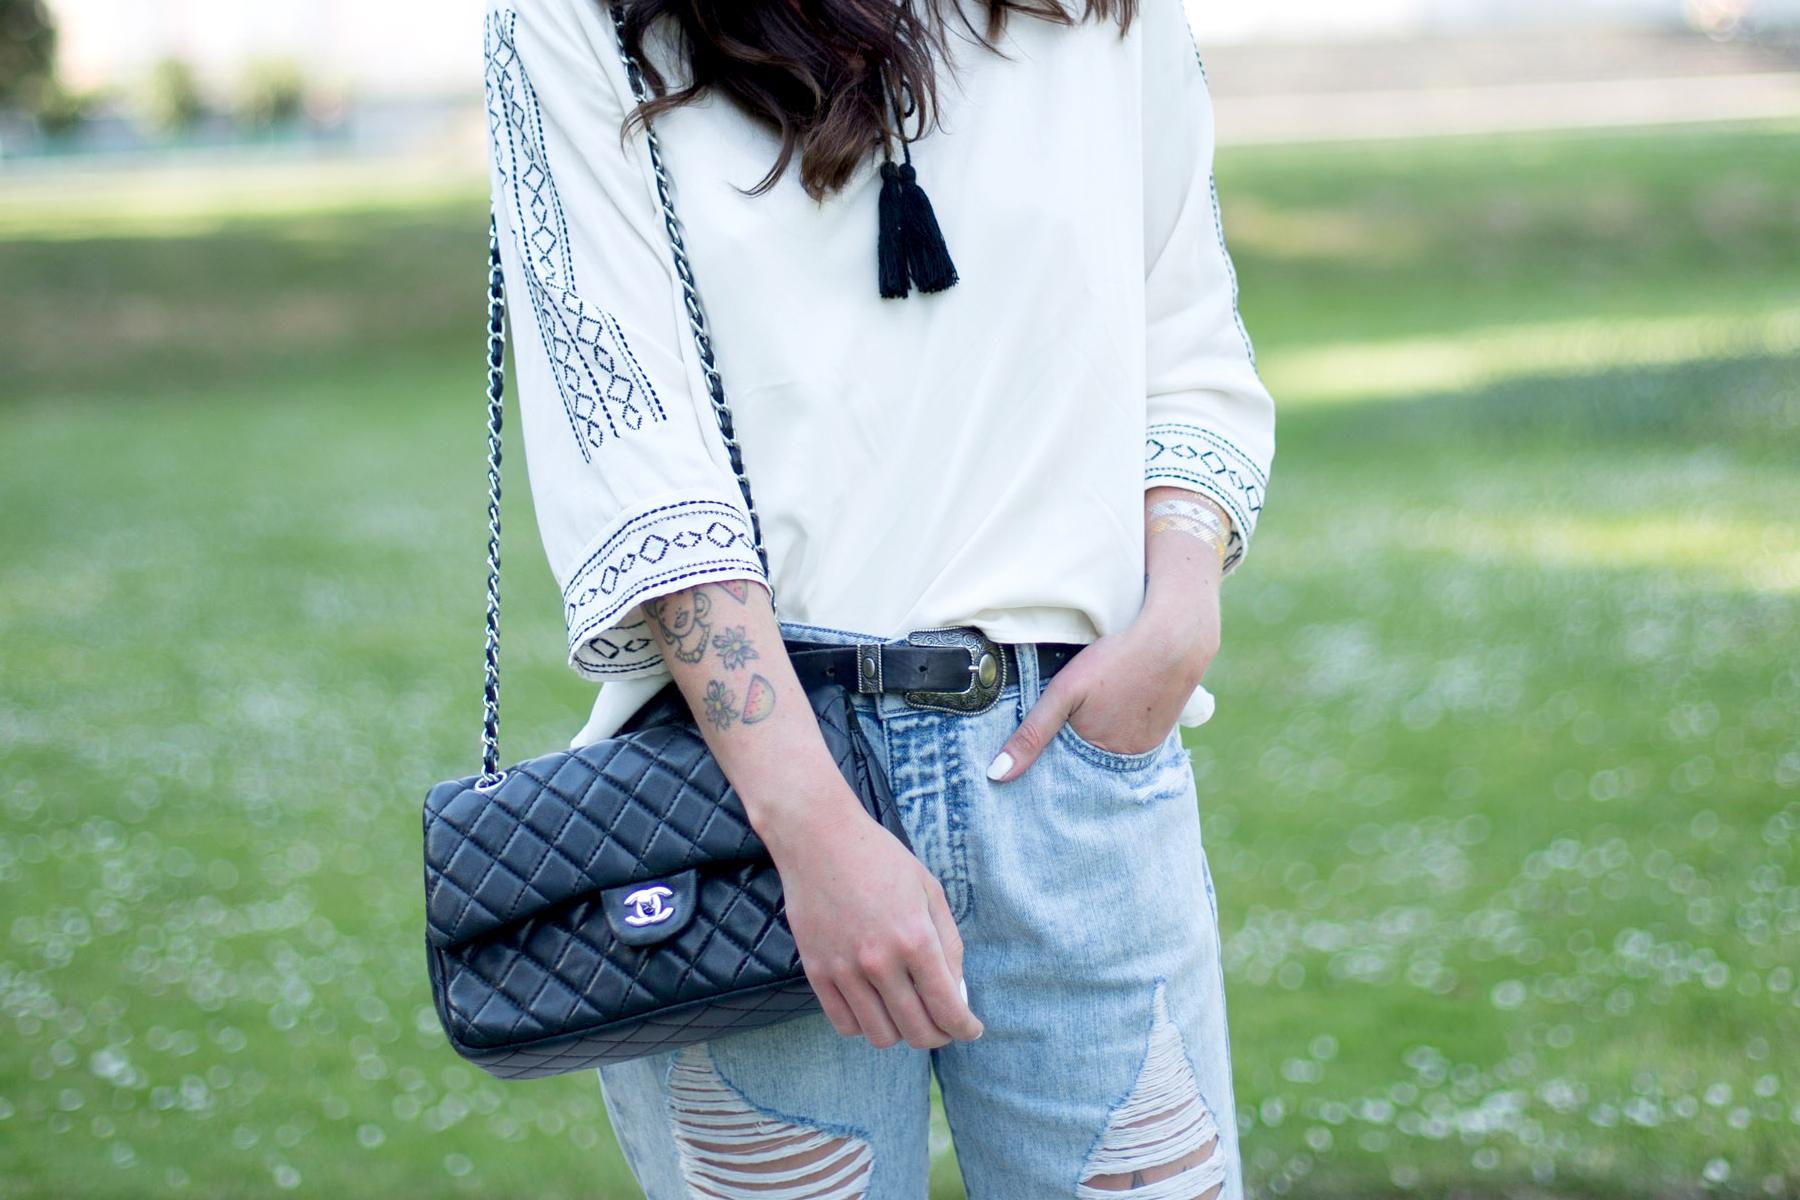 jeans girl ripped denim shopbop styling summer düsseldorf dusseldorf fashion blogger germany cats & dogs ricarda schernus chanel 3